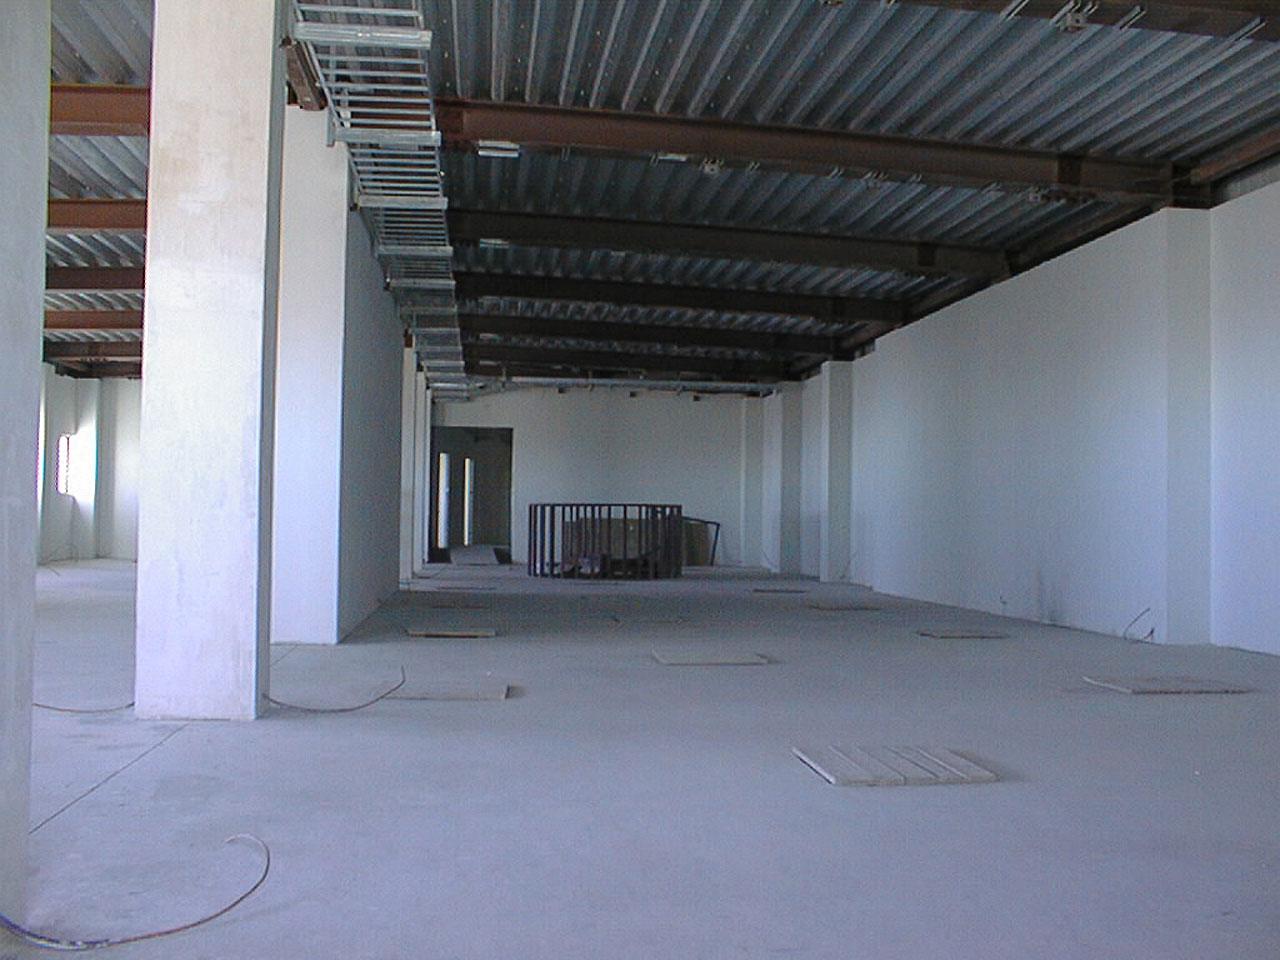 Inside the VLT control Building